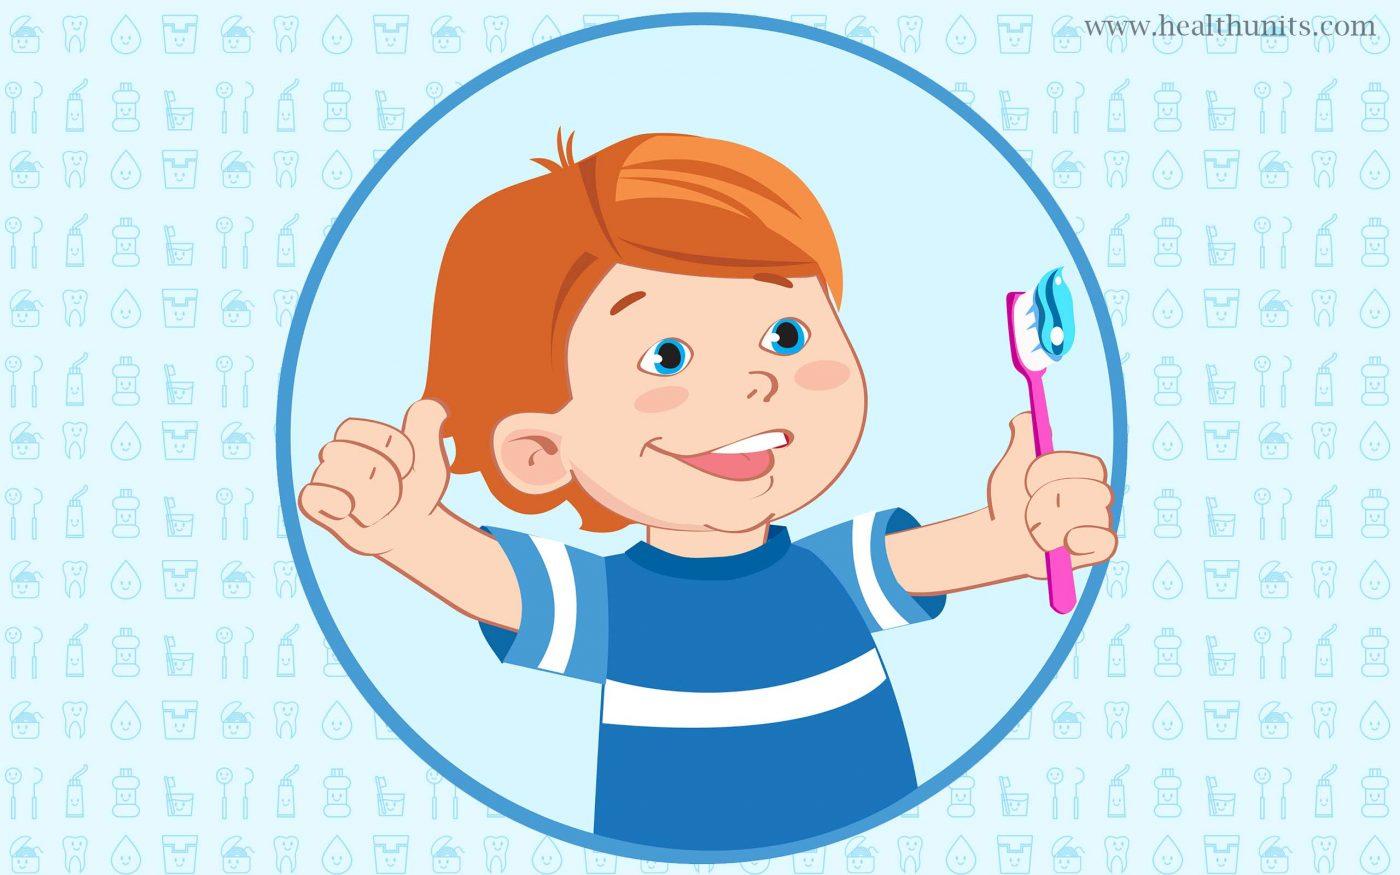 All-Michigan-kids-get-dental-coverage-after-legislatures-budget-move.jpg